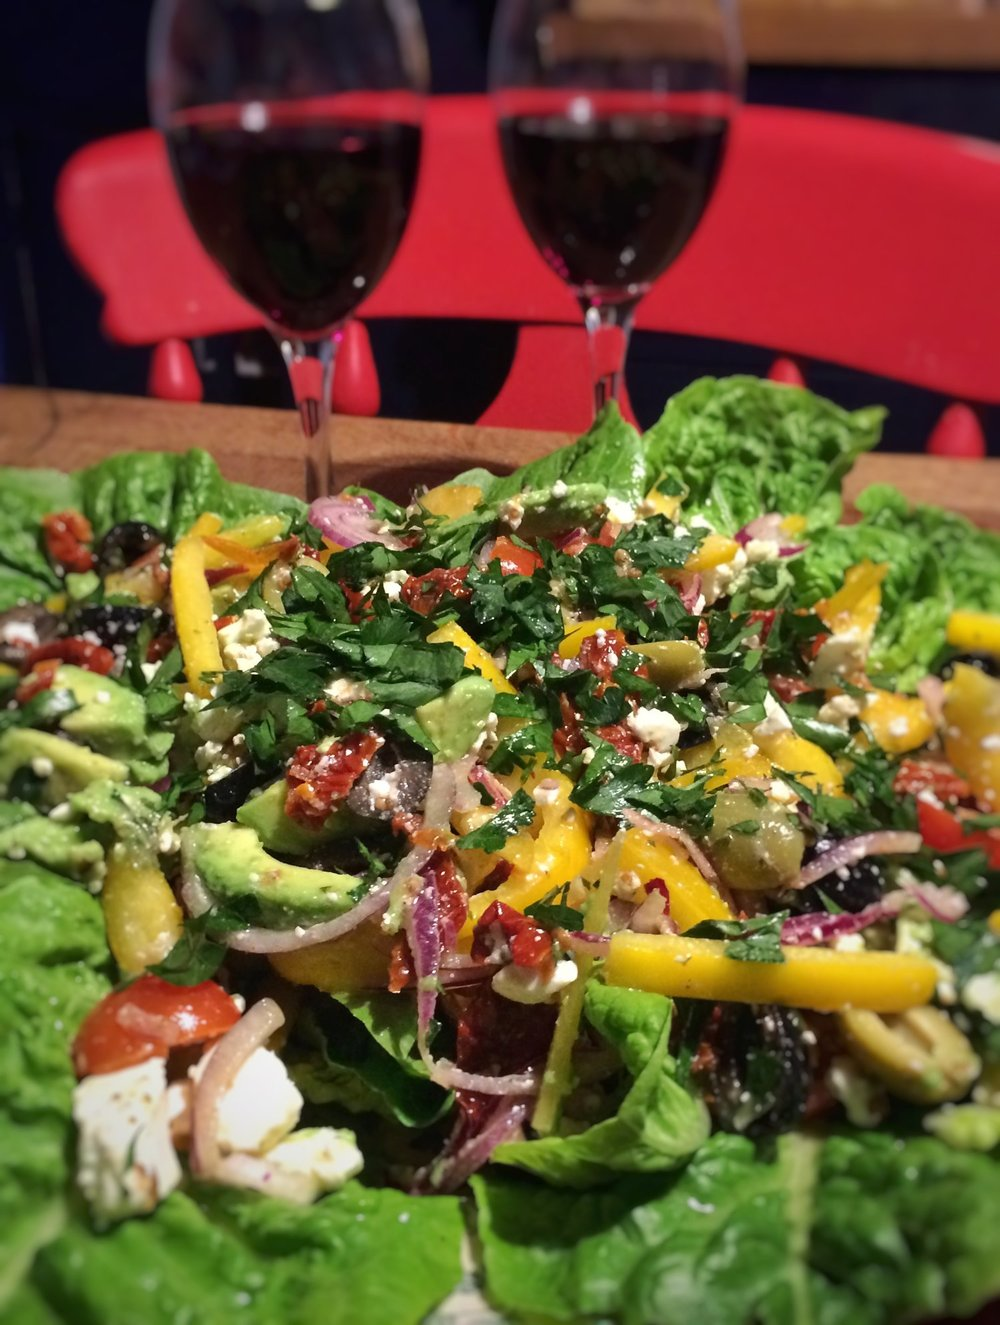 Greek salad, my favourite accompaniment to an occasional steak.